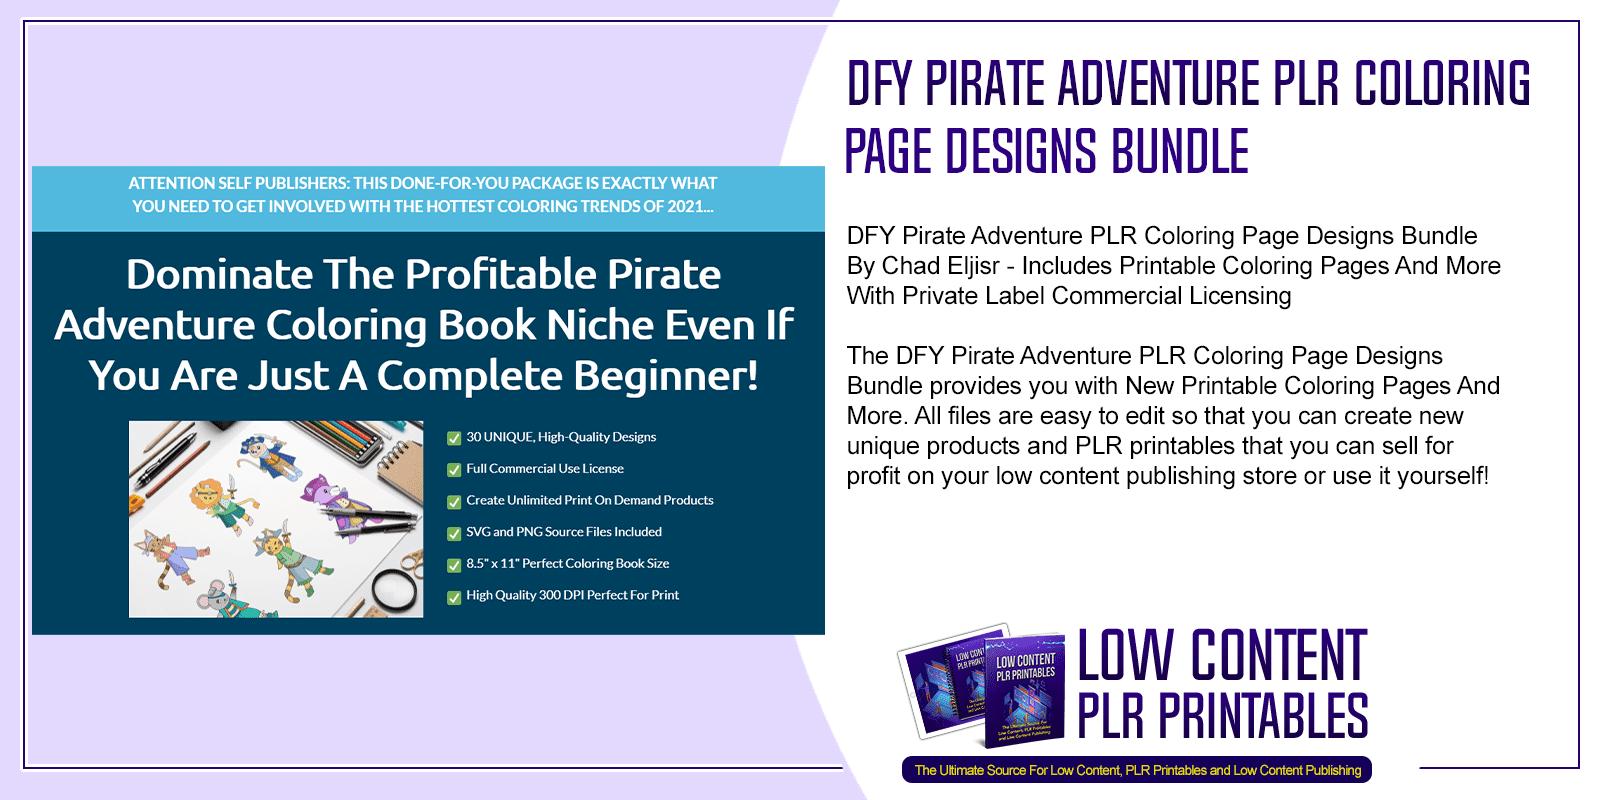 DFY Pirate Adventure PLR Coloring Page Designs Bundle